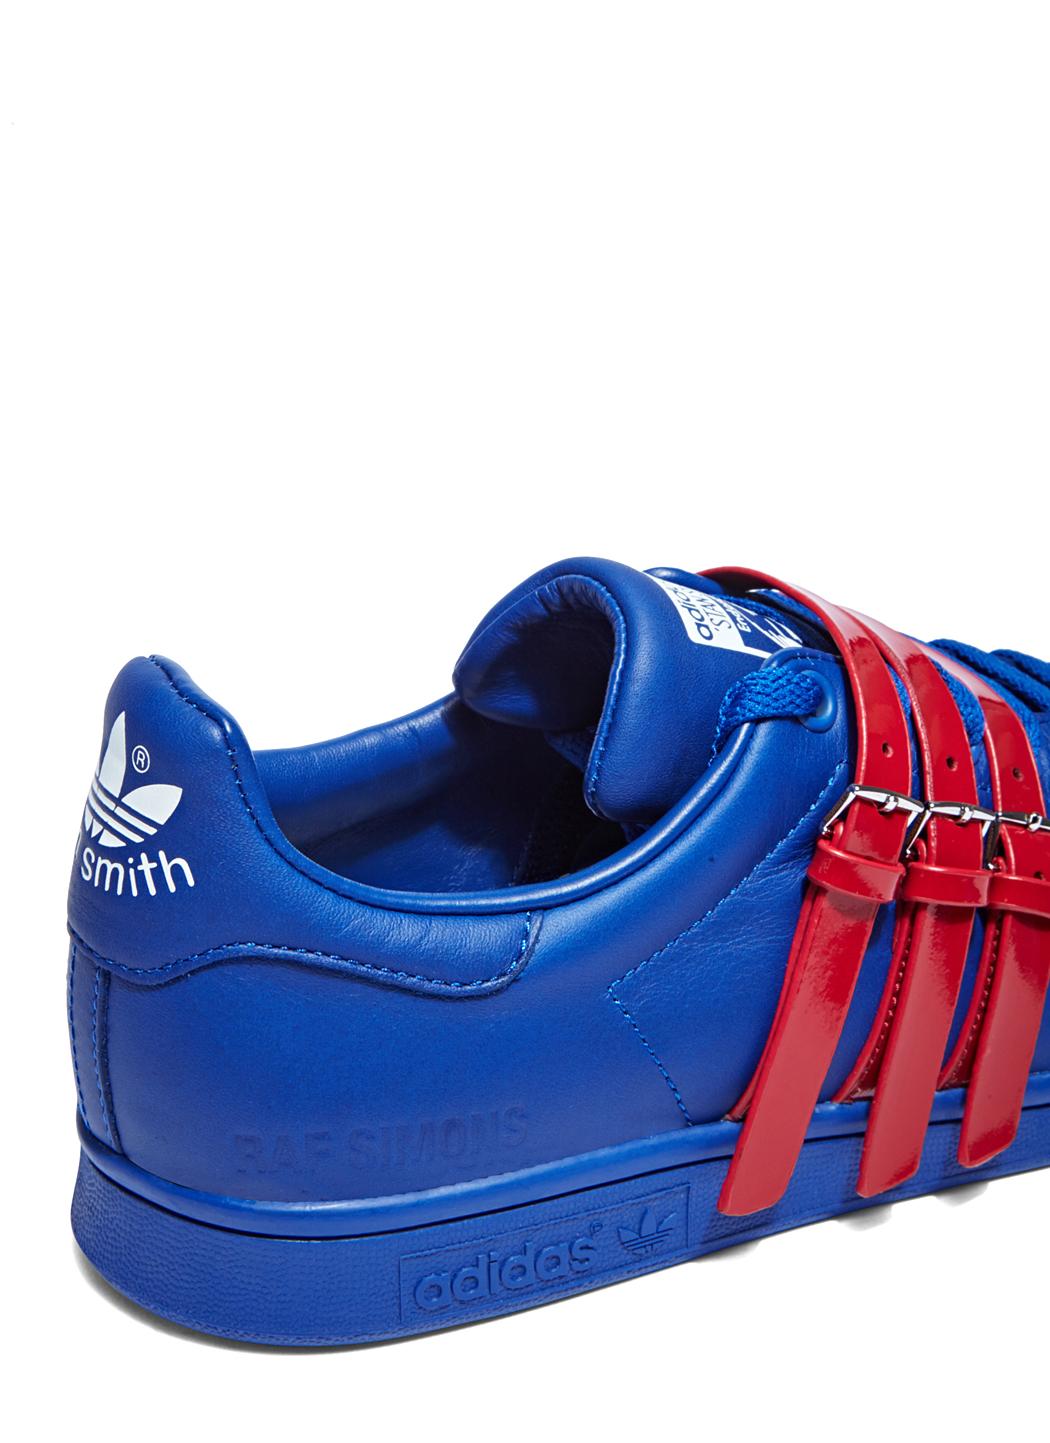 Adidas Raf Simons Shoes Boat Shoes